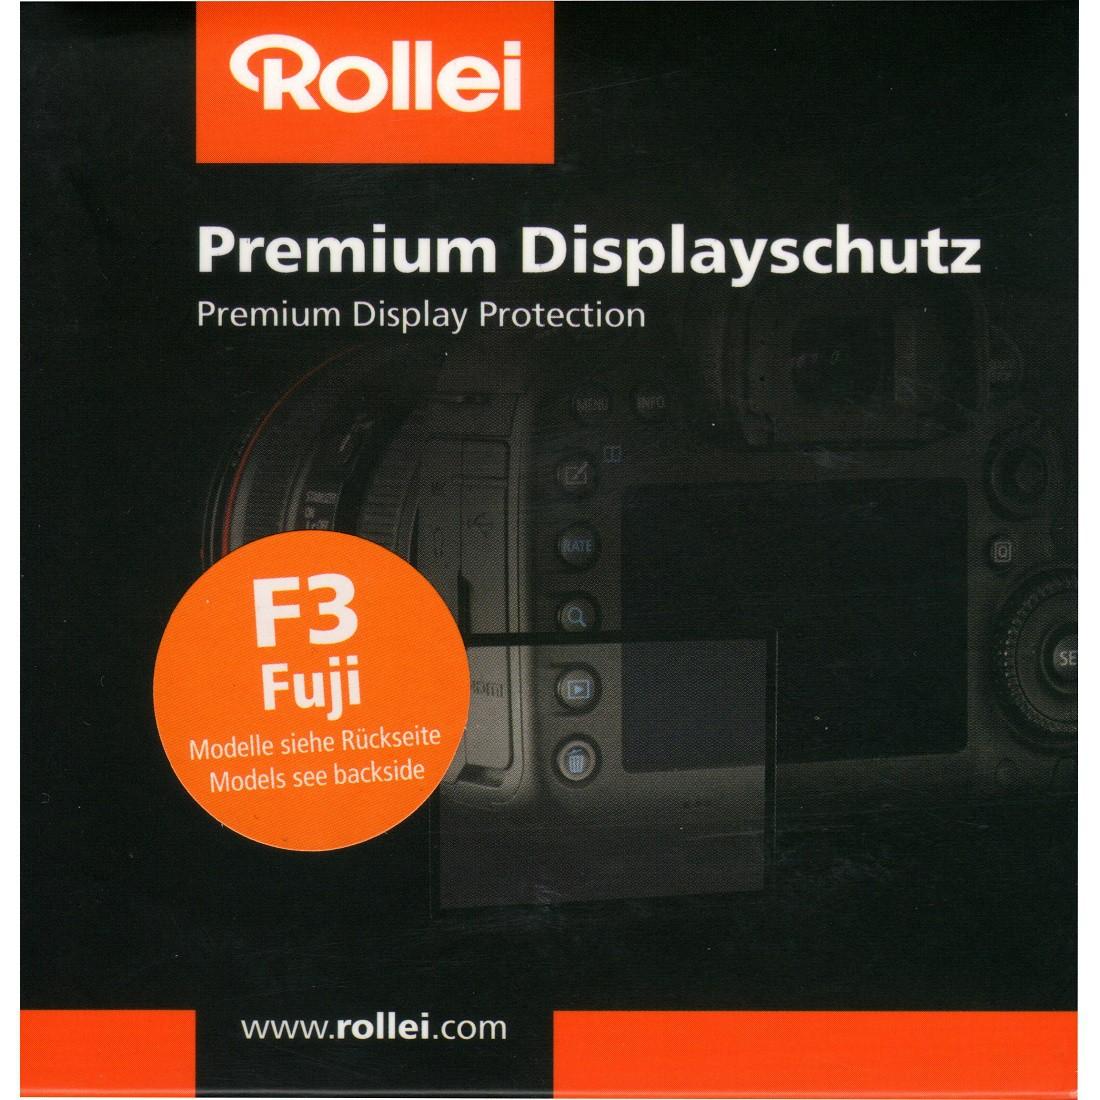 Rollei Premium Displayschutz F3 Fuji X-Pro2